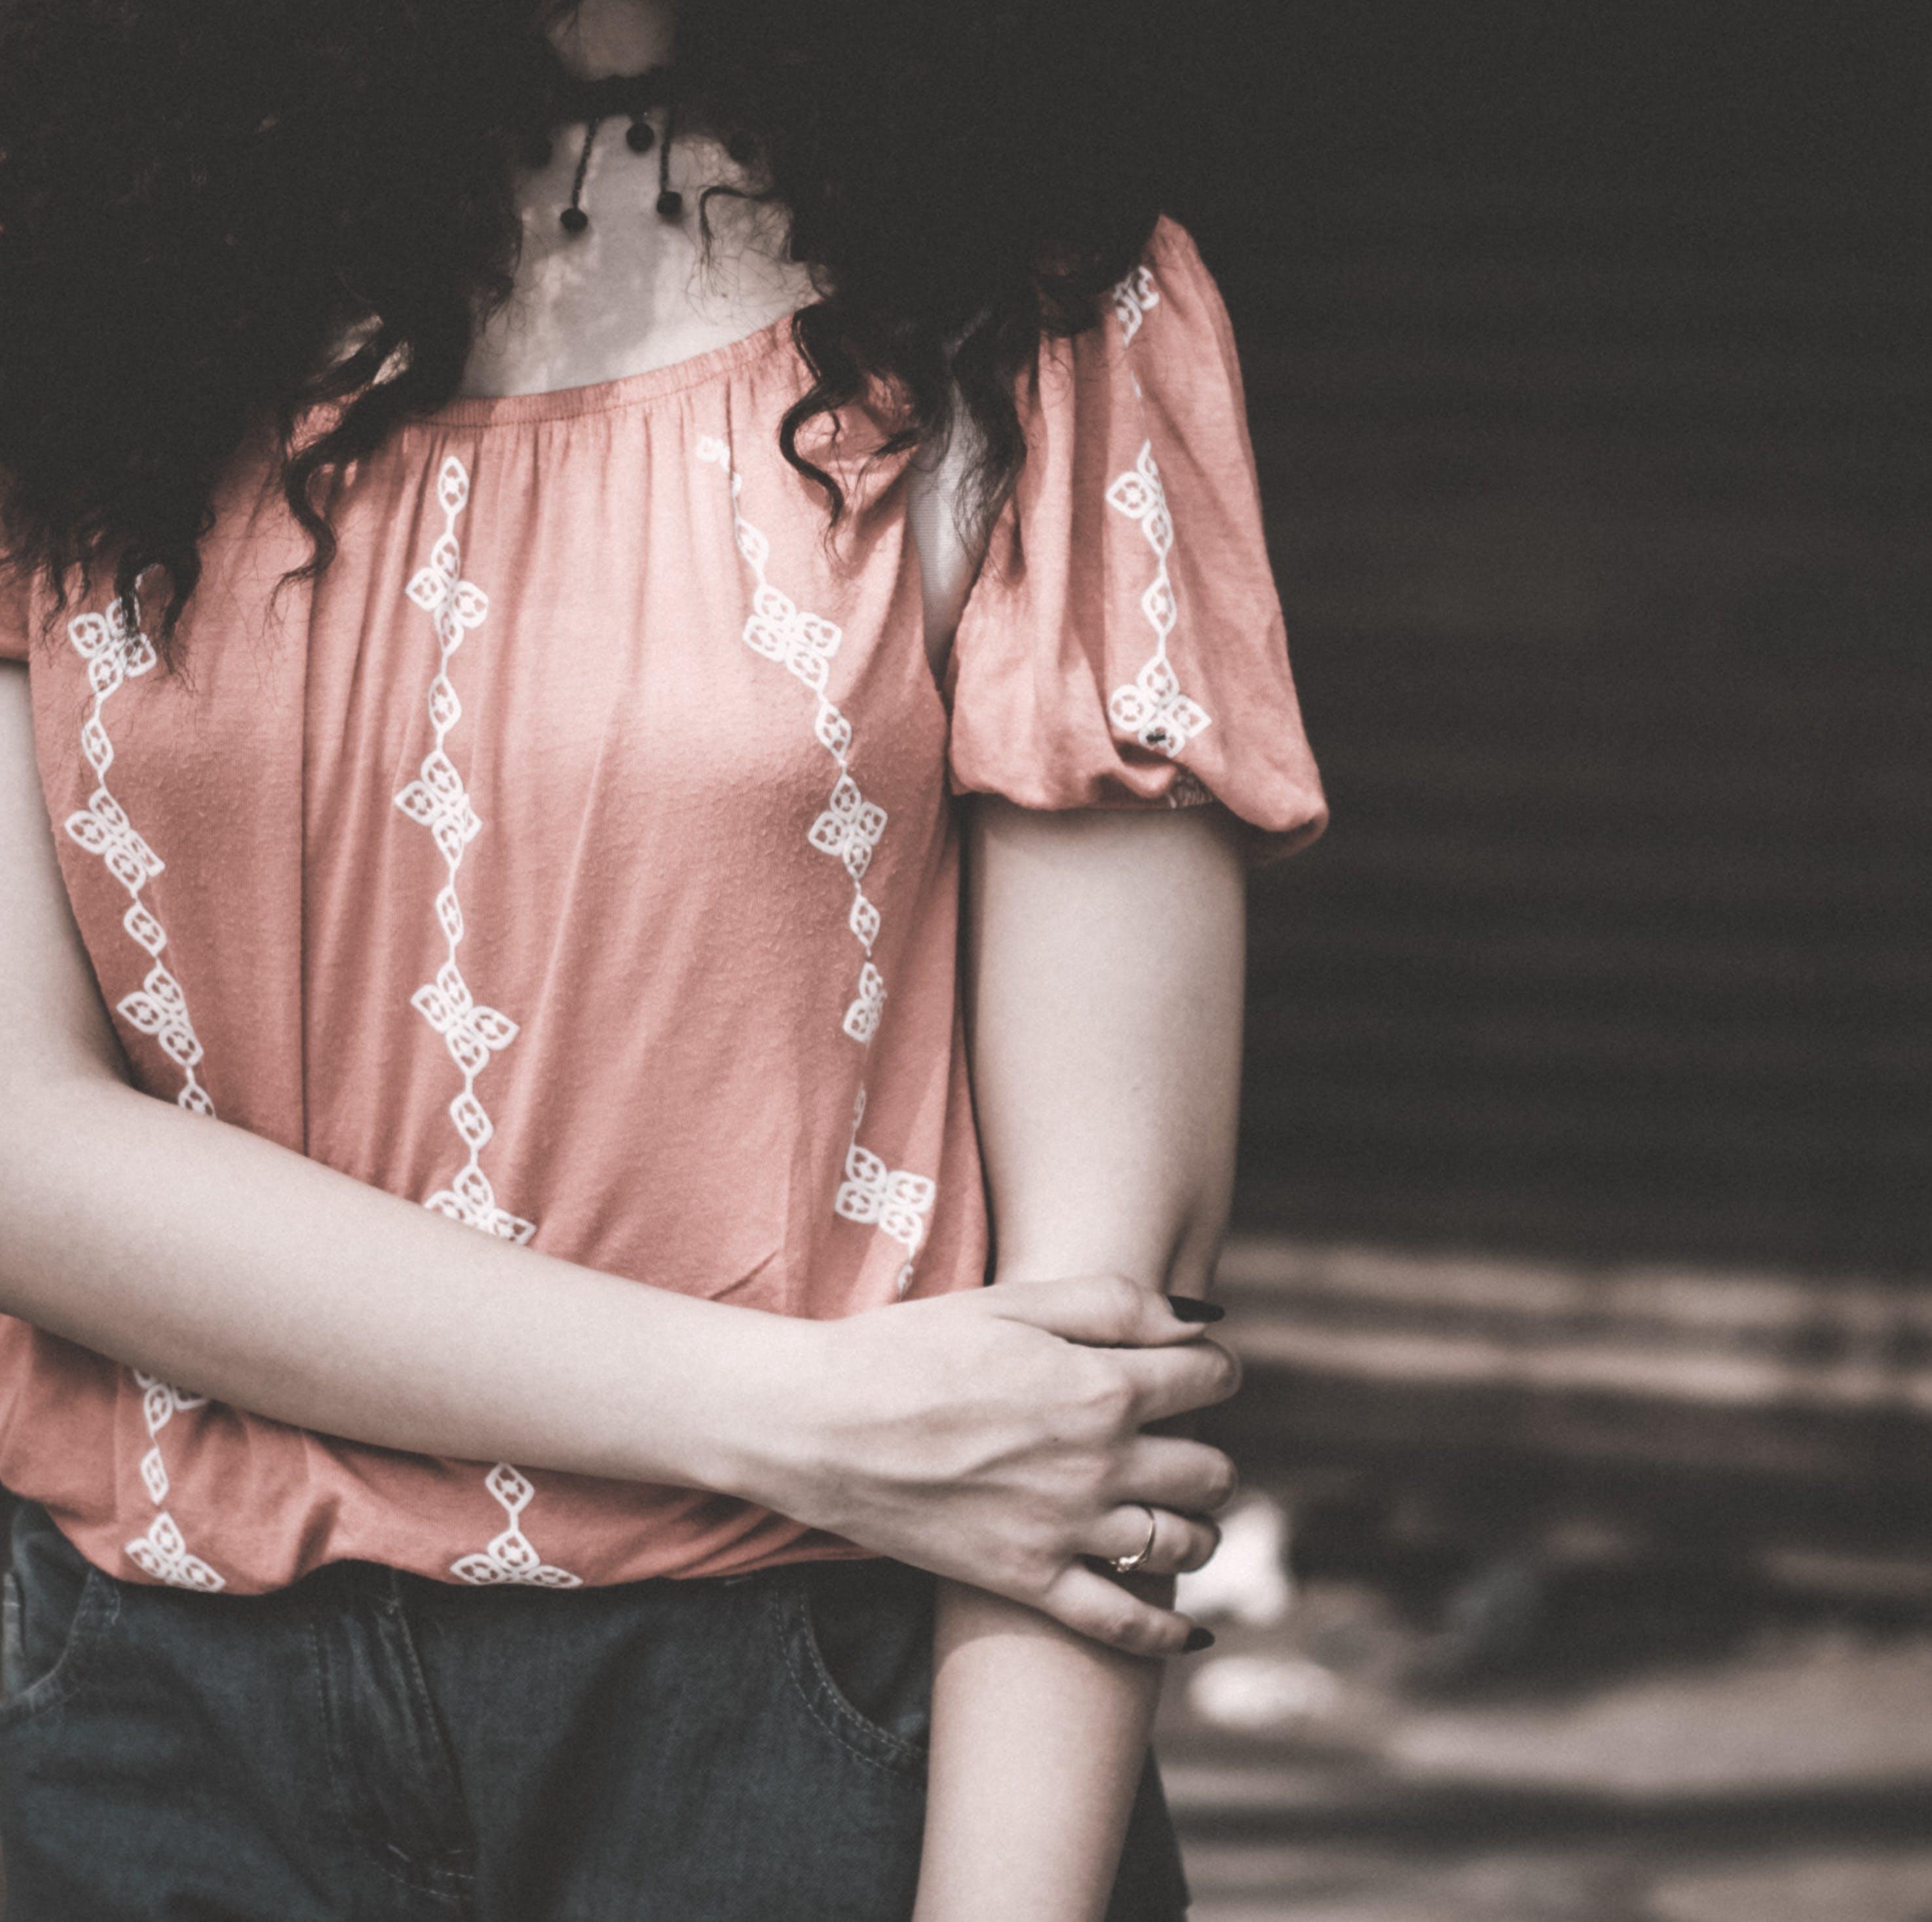 details, fashion, girl